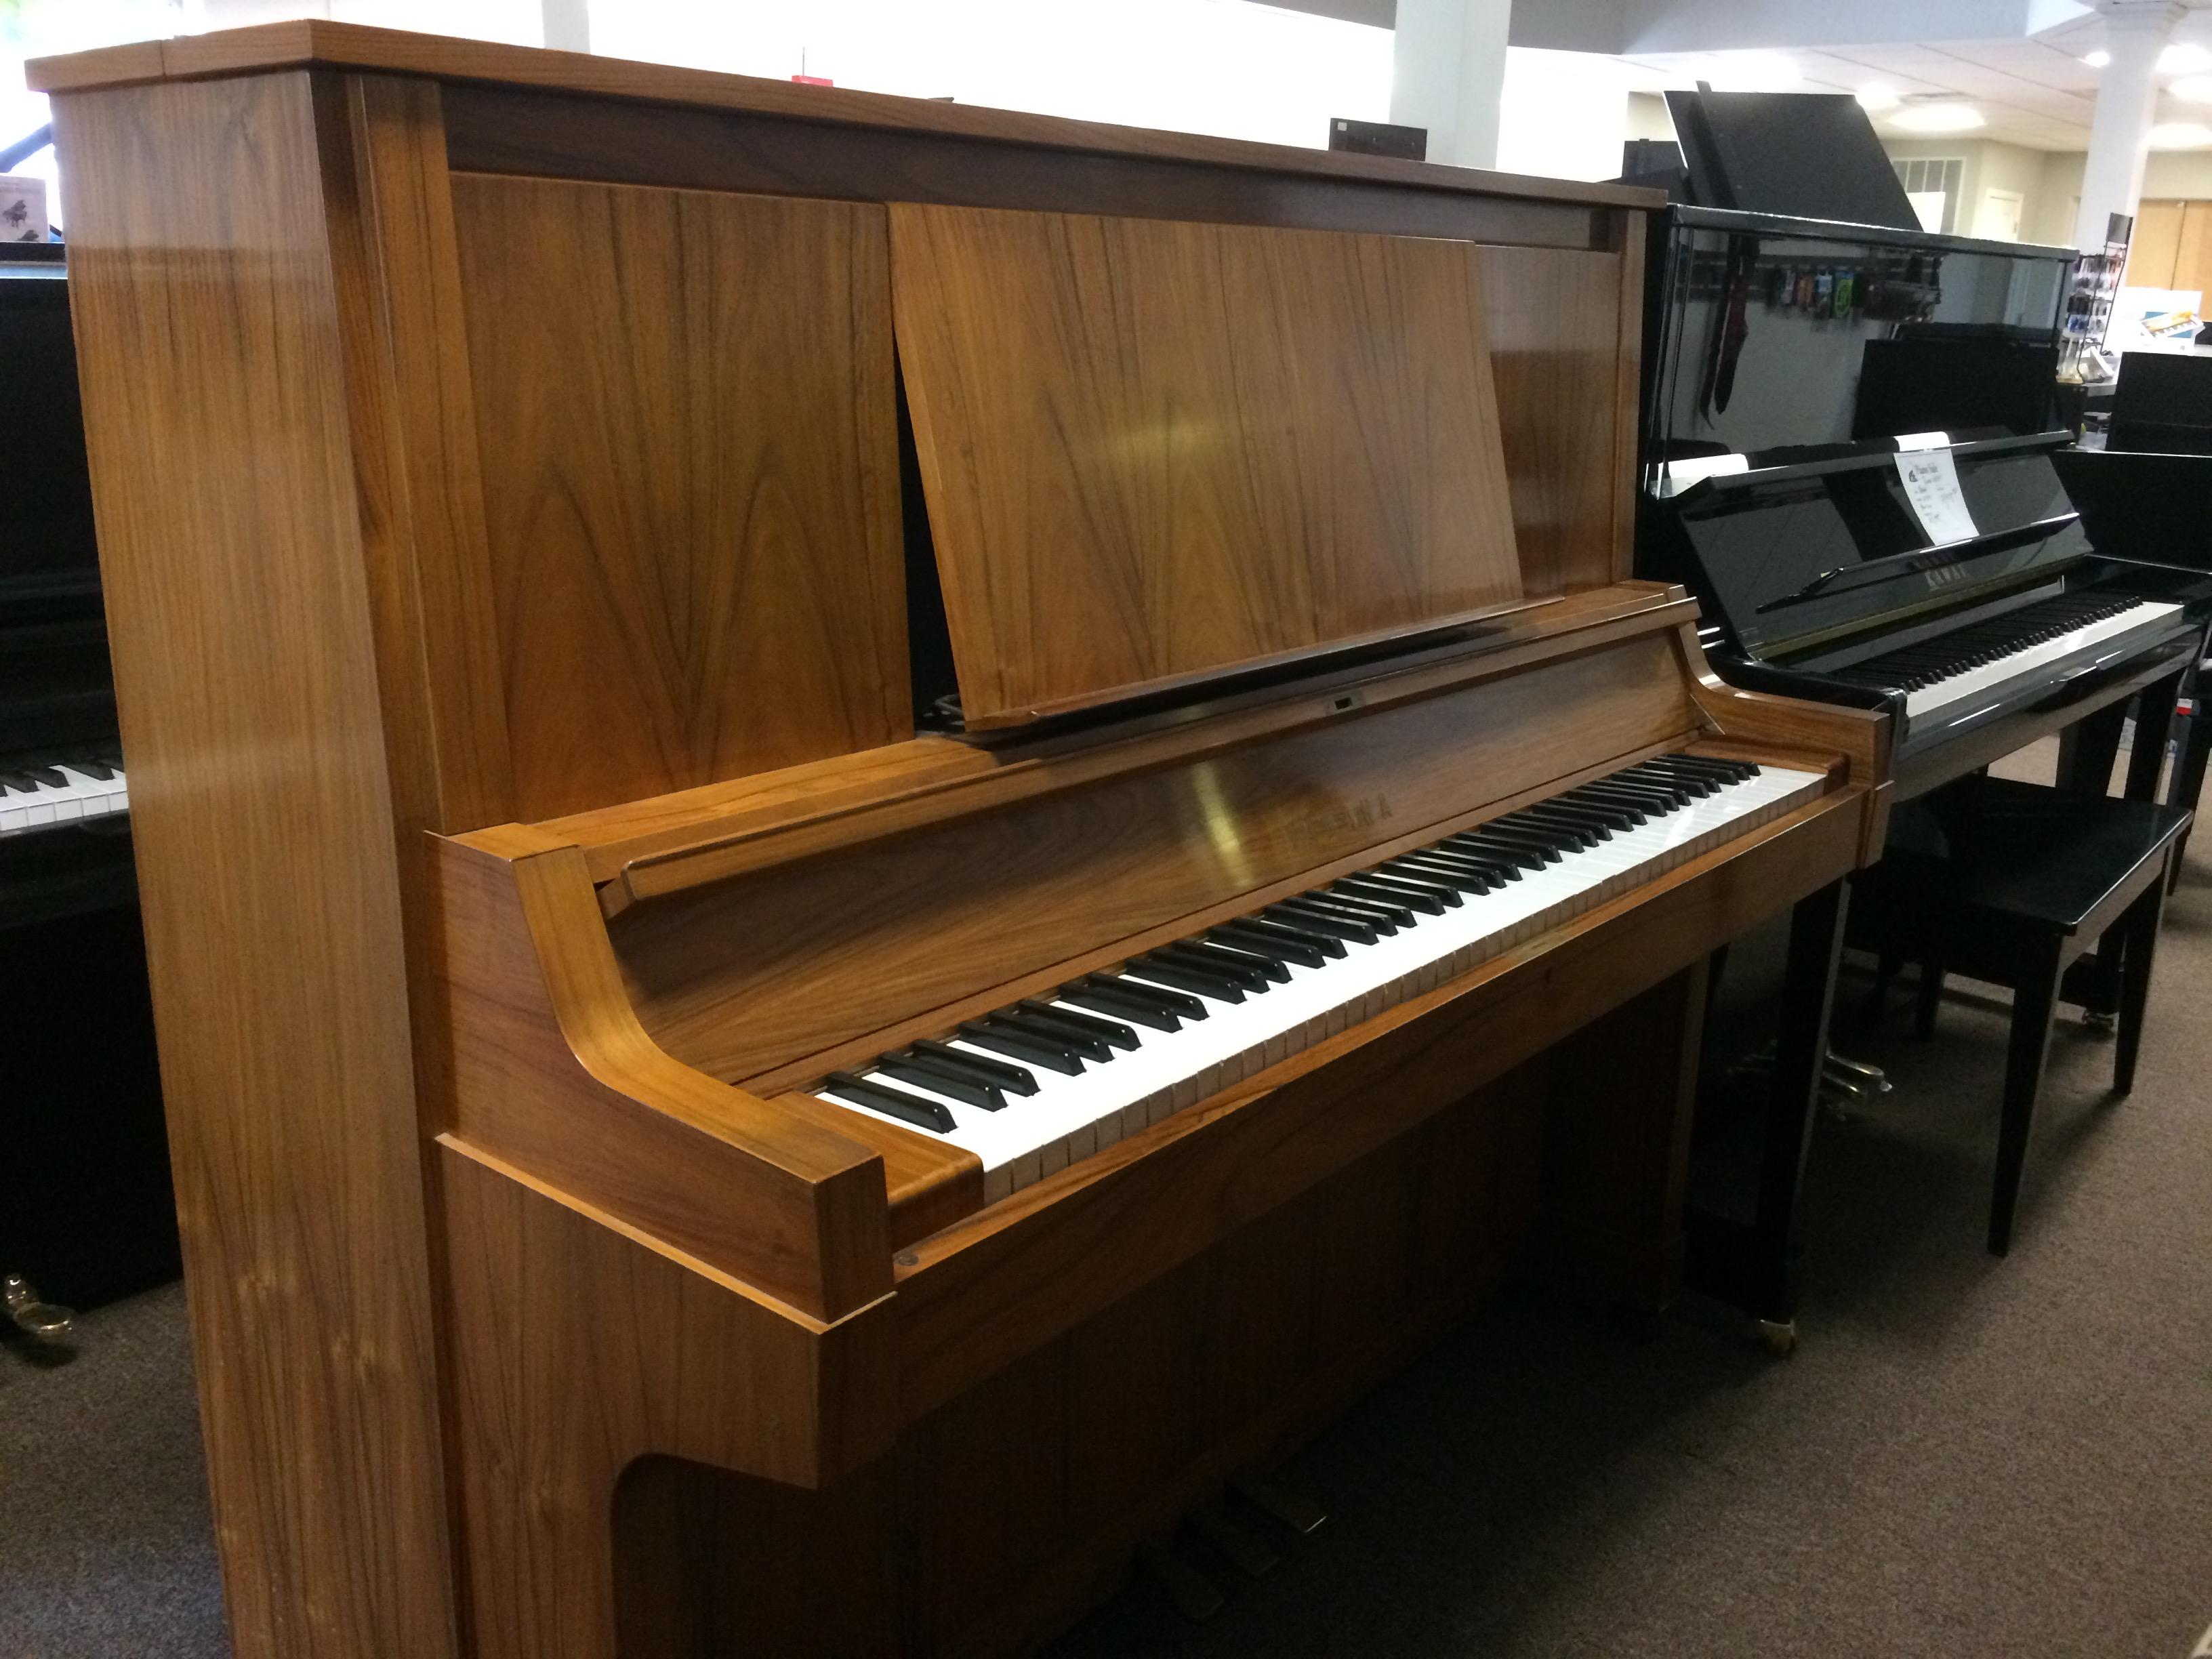 Pre owned rare yamaha u2 with exotic walnut case 5 400 for Yamaha u2 piano